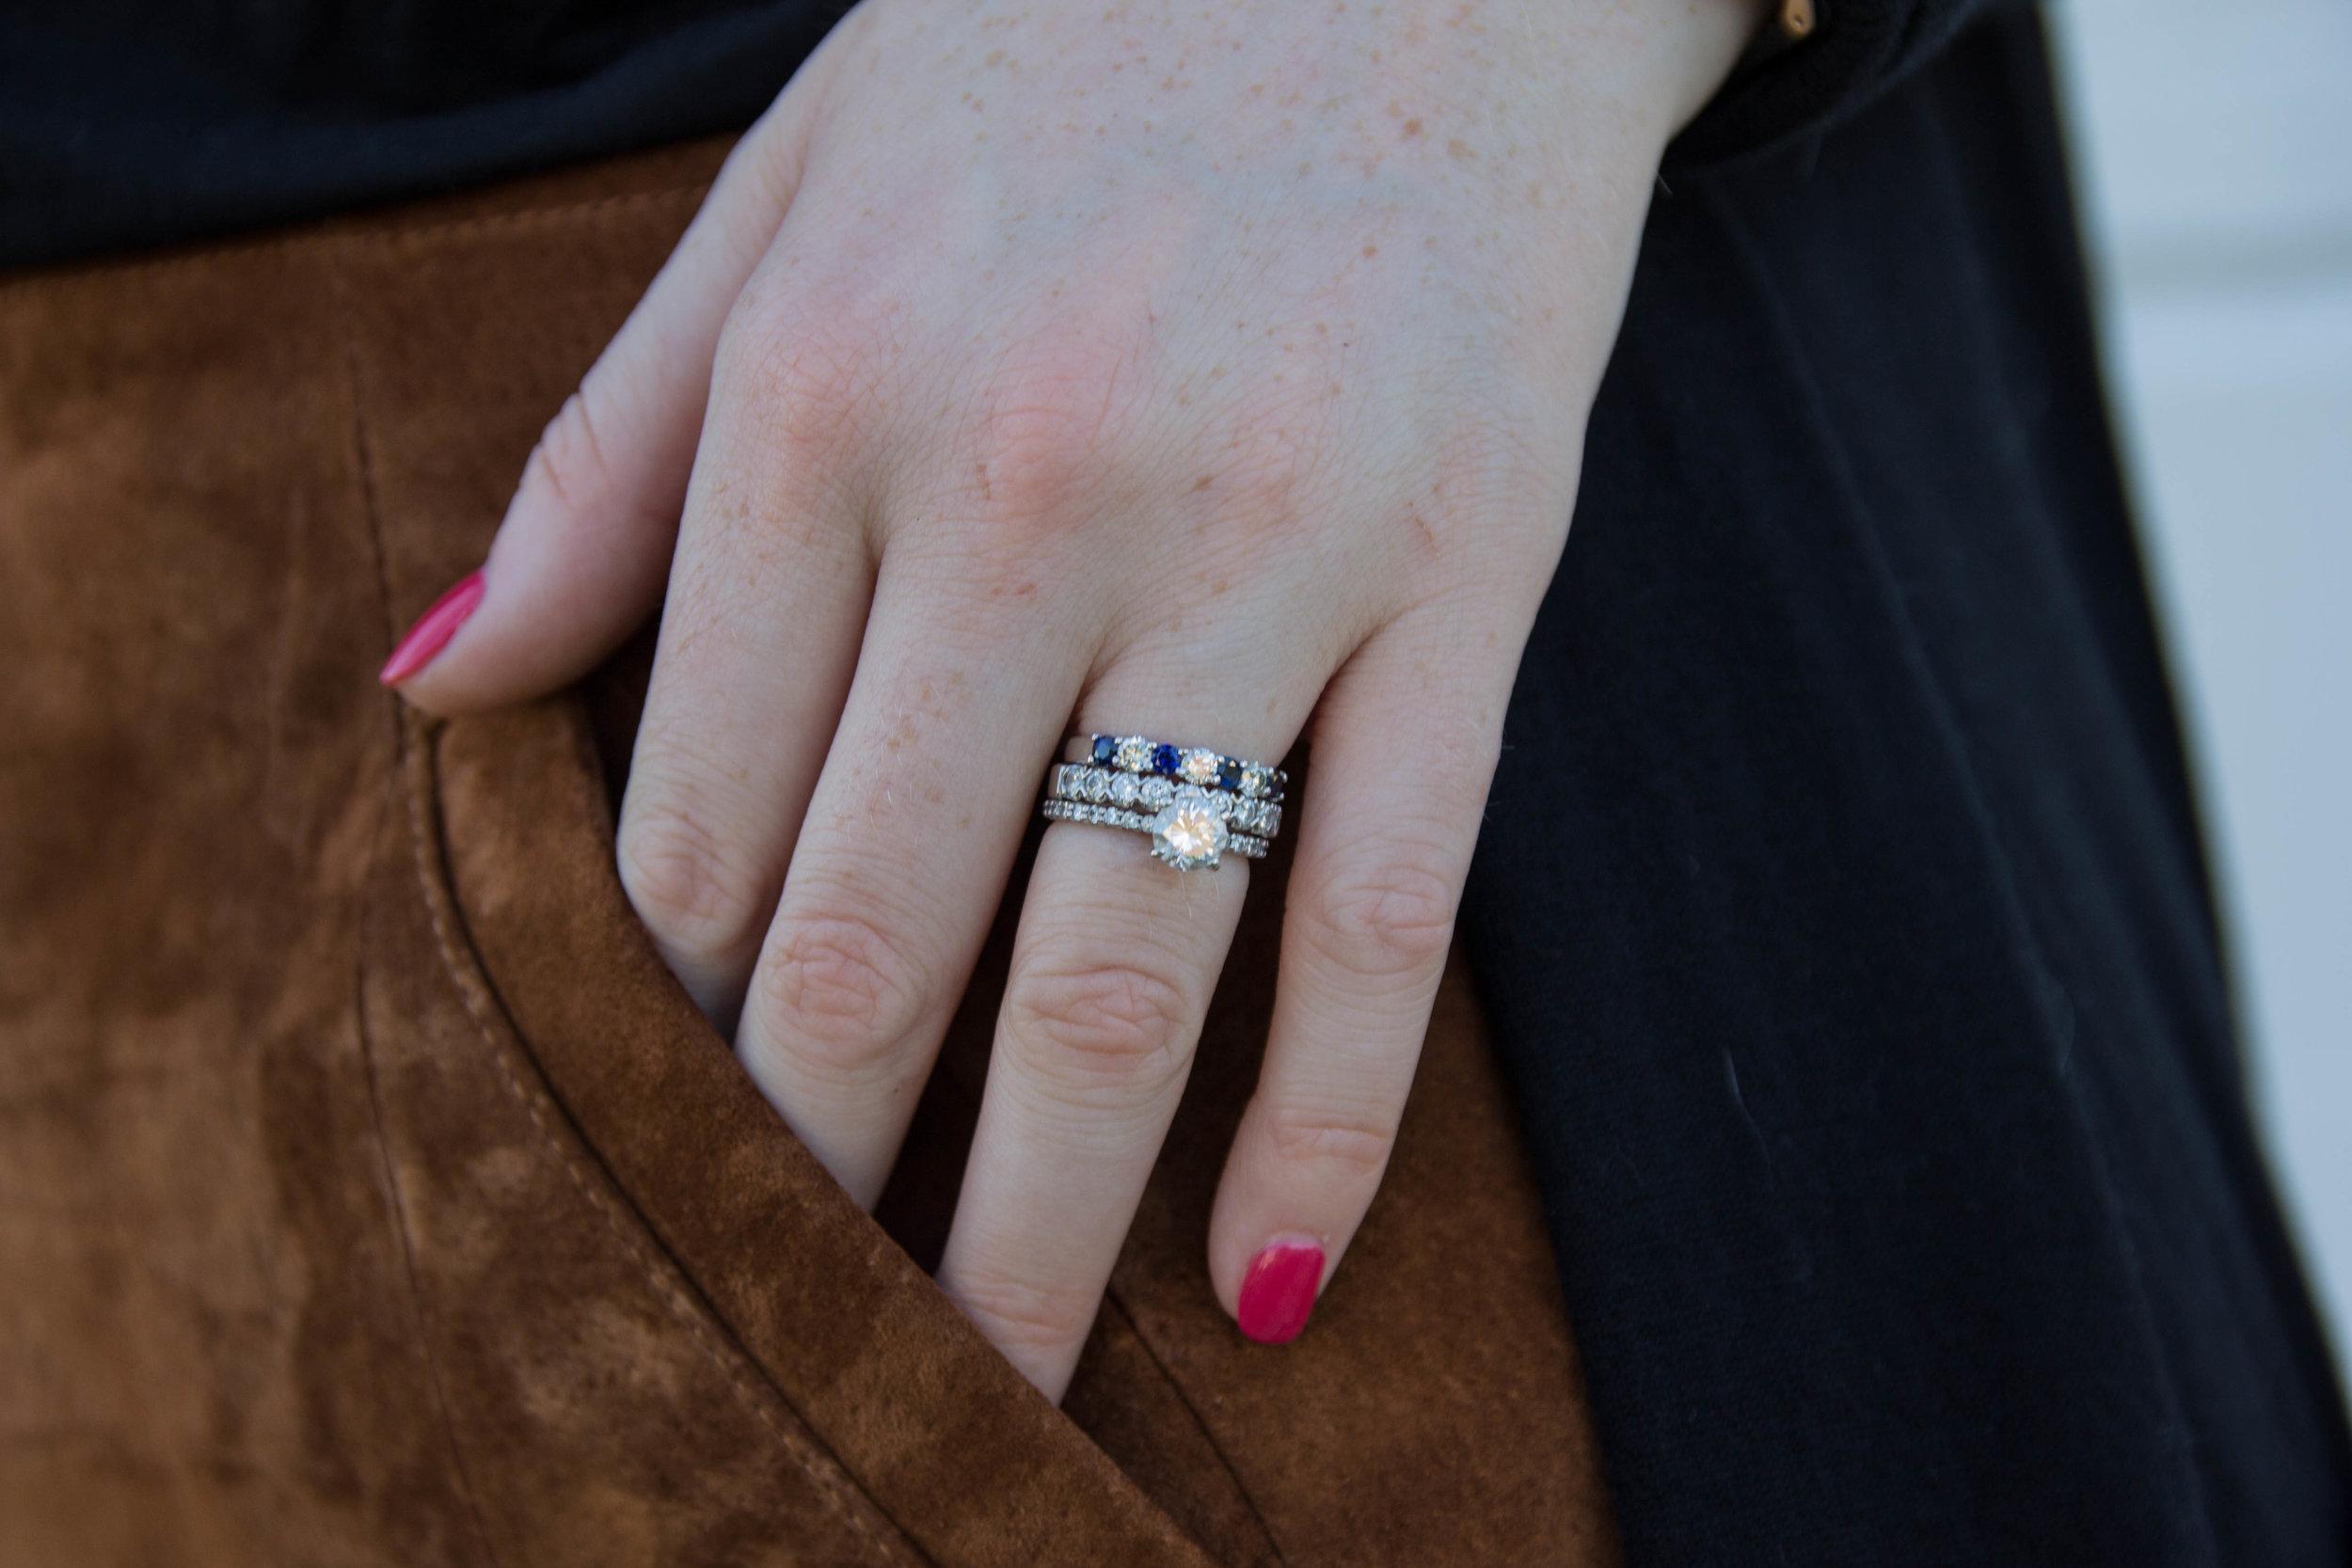 blanknyc suede miniskirt, custom by kathleen, dallas custom jeweler, custom jewelry designer in dfw, custom wedding rings